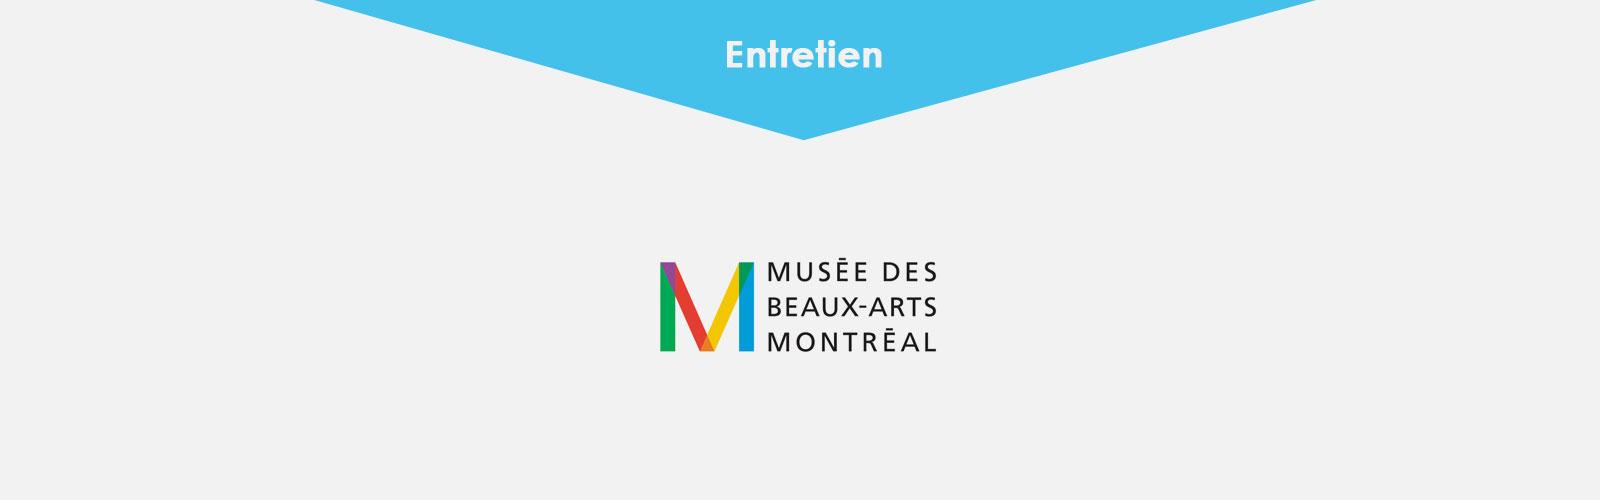 entretien-anna-ajoubair-musee-beaux-arts-montreal